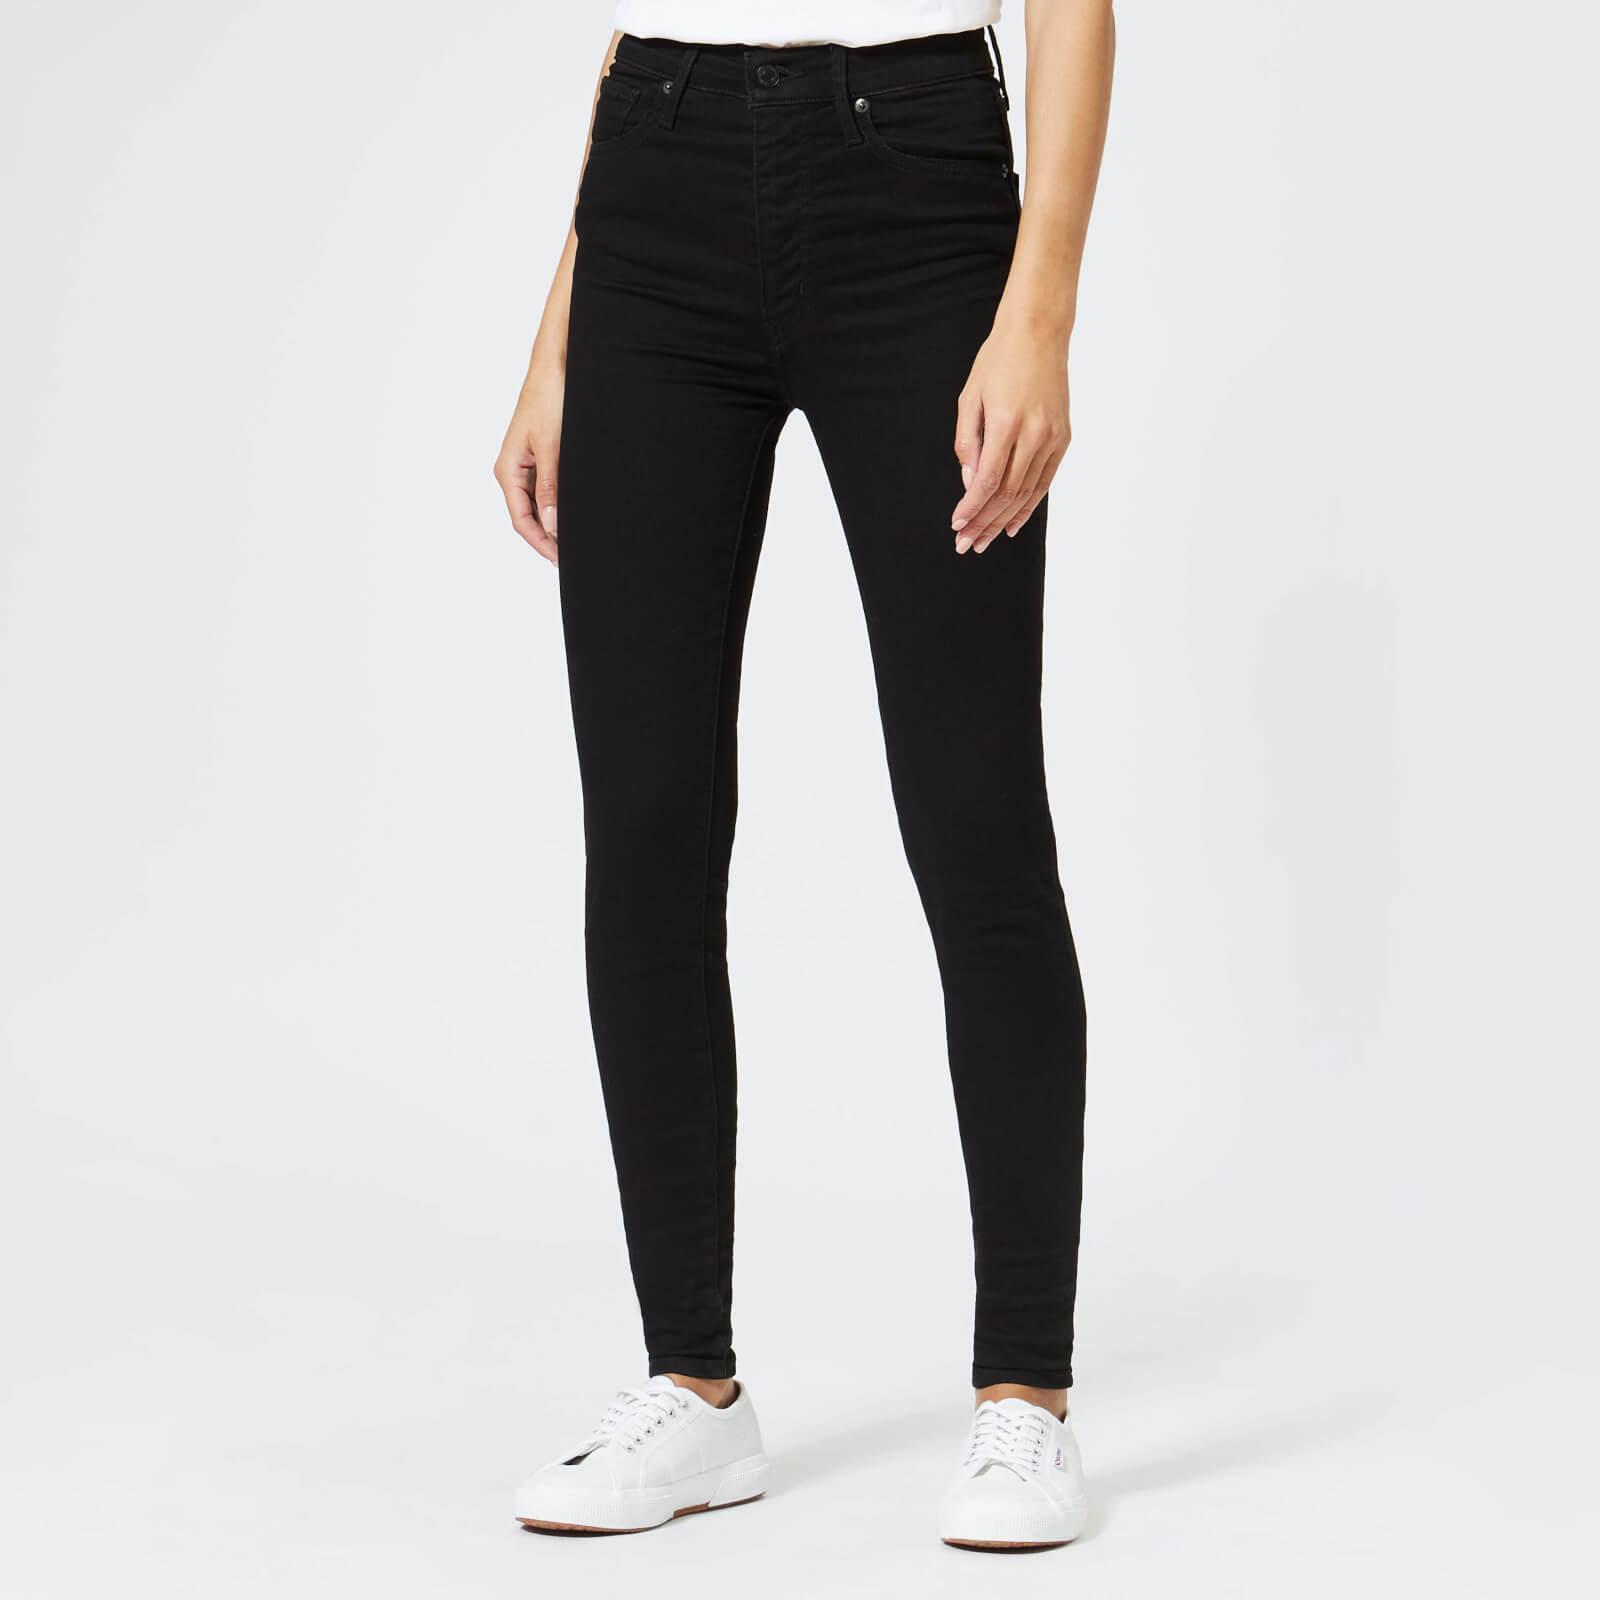 Levi's s Mile High Super Skinny Jeans - Black Galaxy - W30/L30